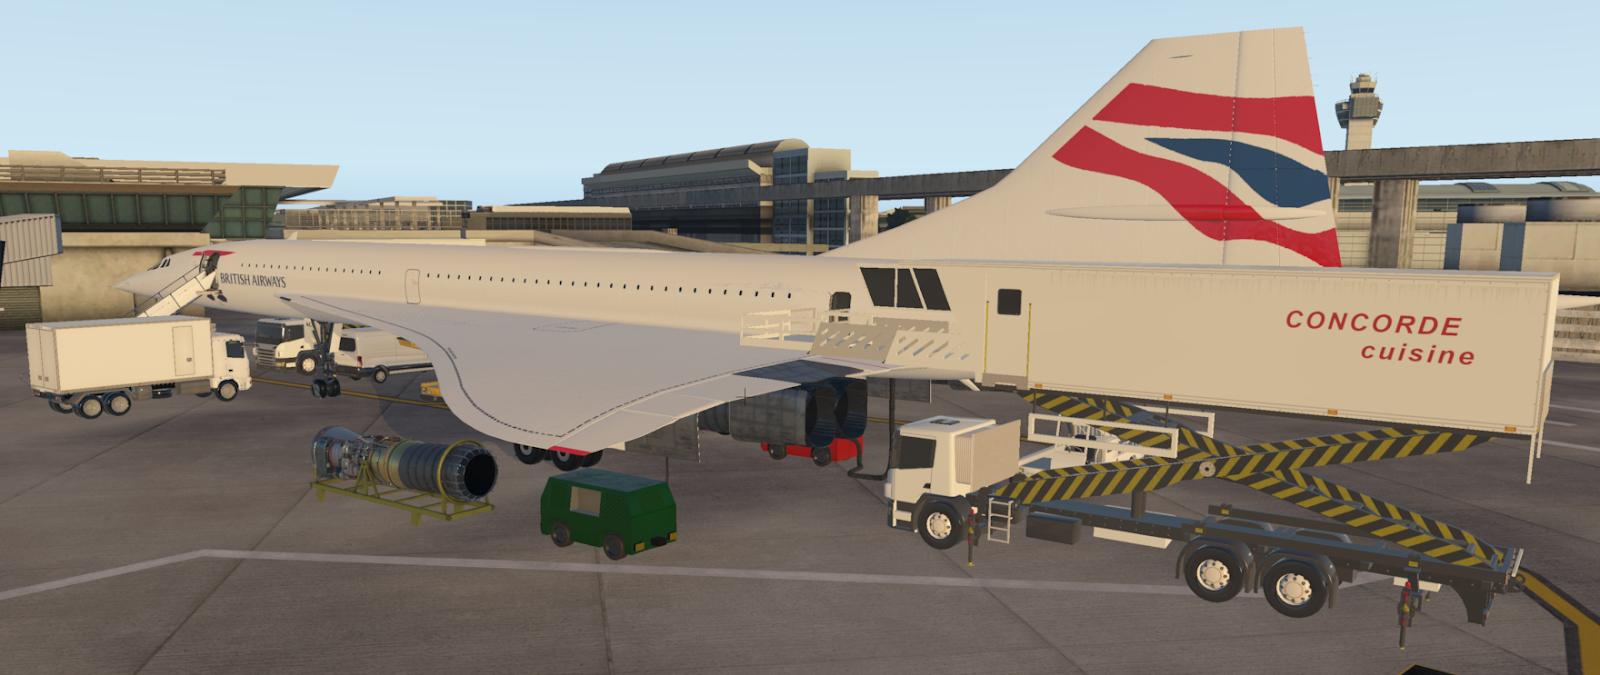 Aircraft Ground Operations